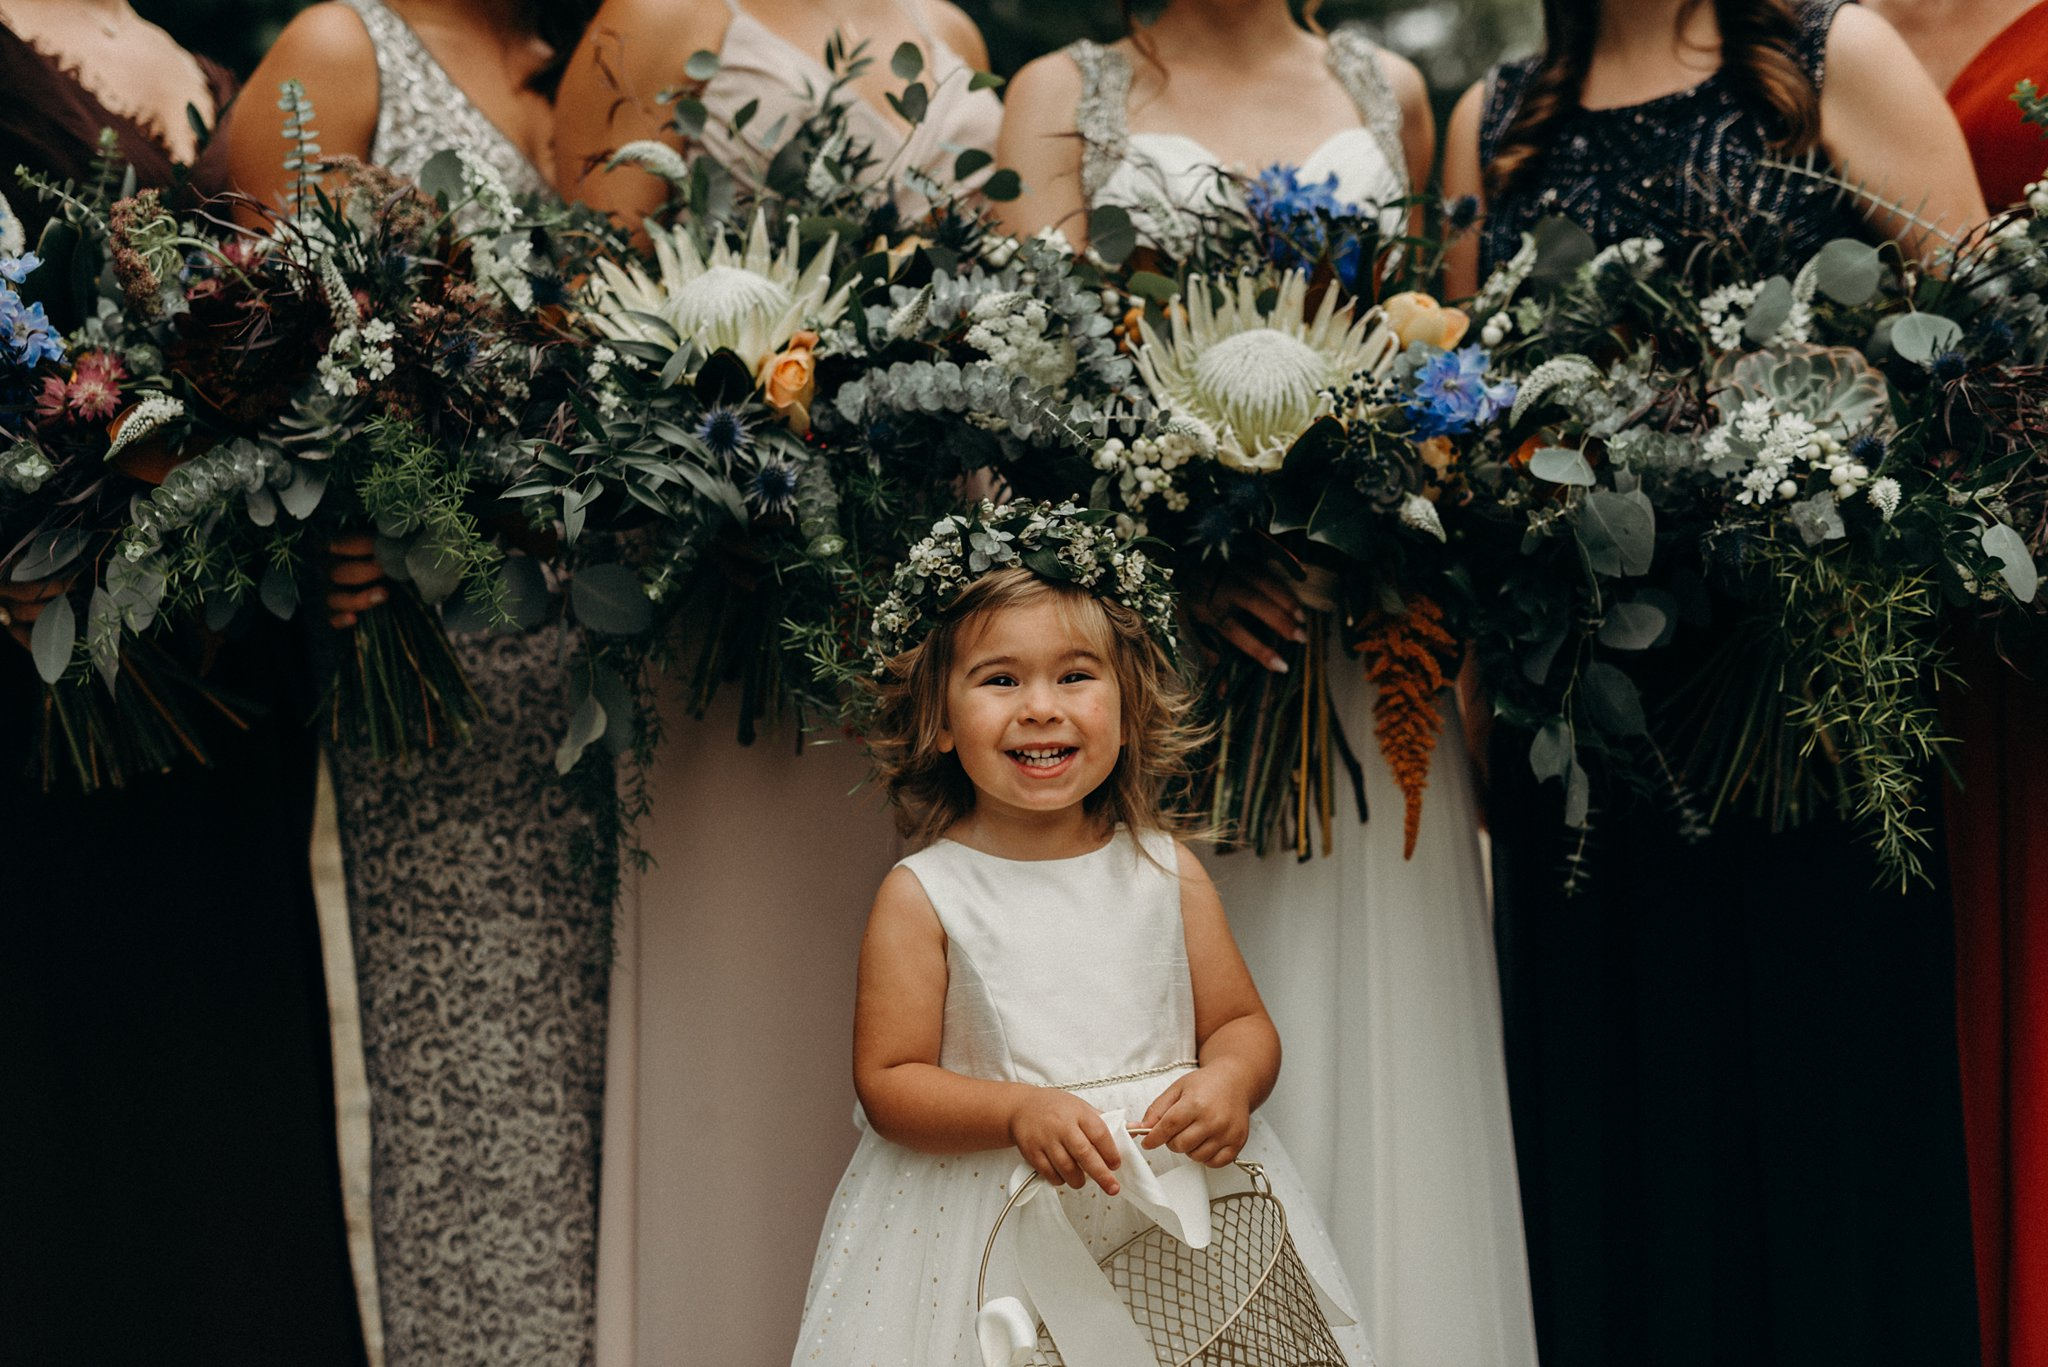 kaihla_tonai_intimate_wedding_elopement_photographer_6608.jpg